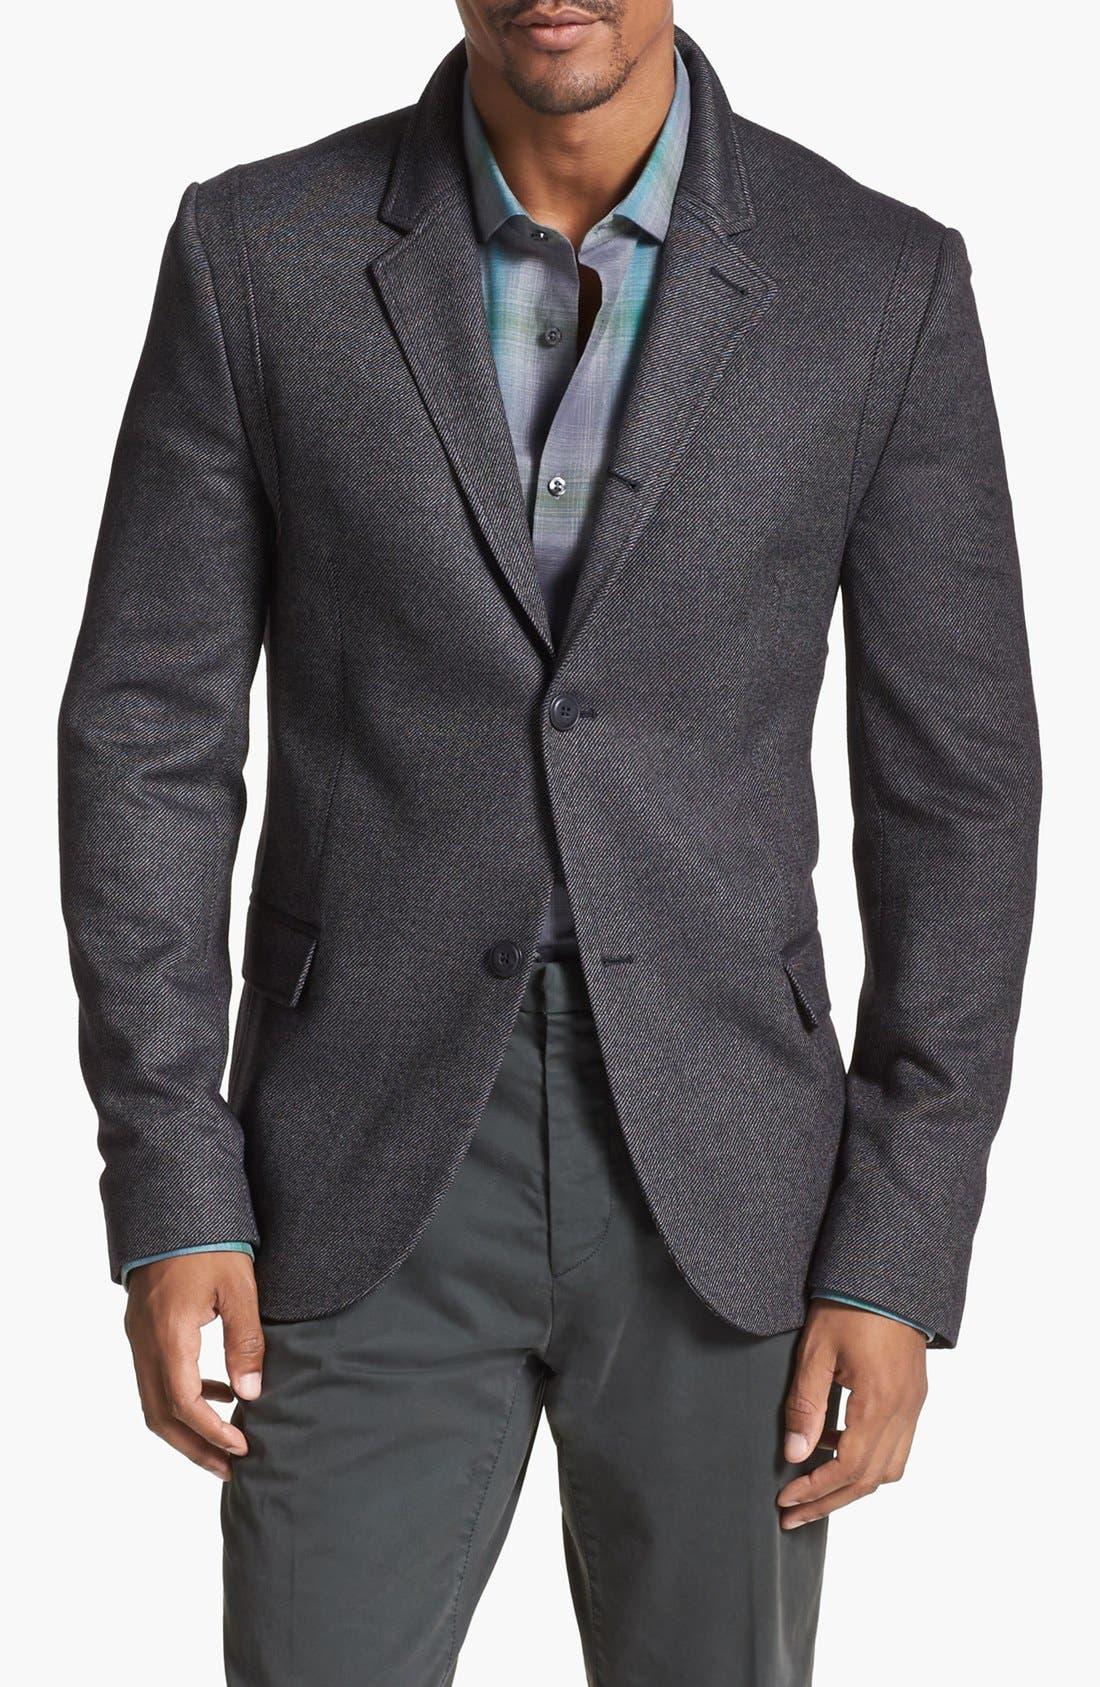 Alternate Image 1 Selected - HUGO 'Adgar' Twill Sportcoat